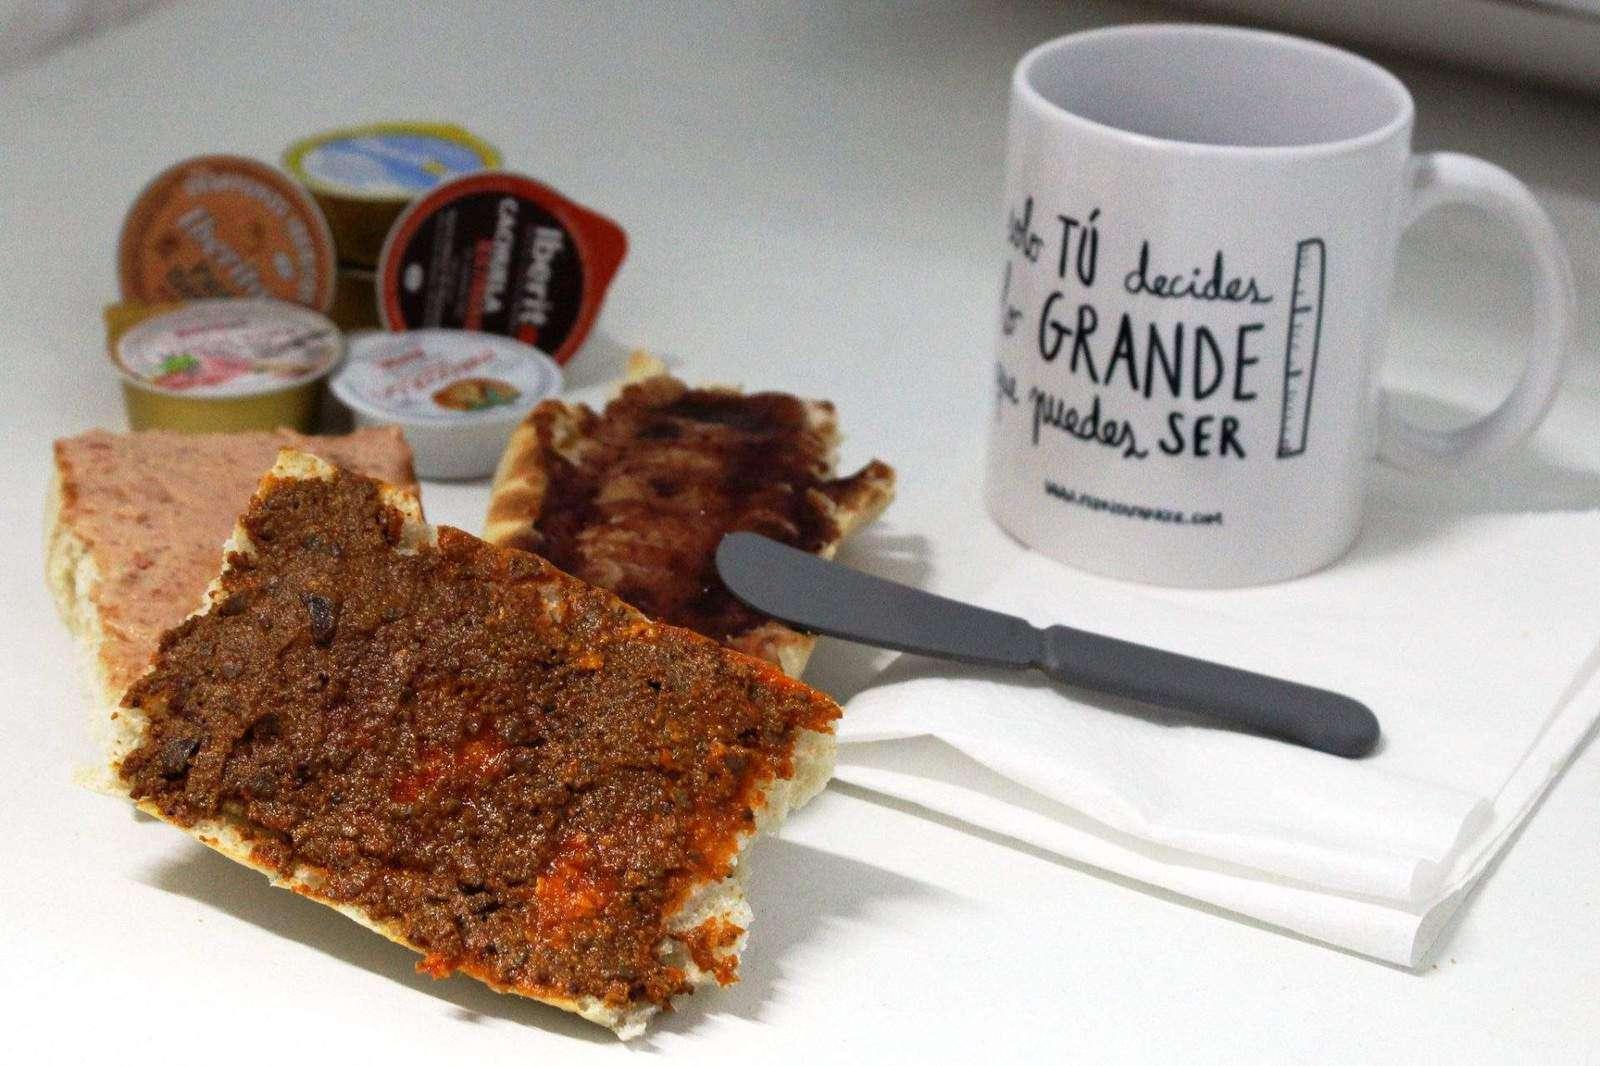 Cachuela extremeña - Descubre la auténtica receta tradicional.